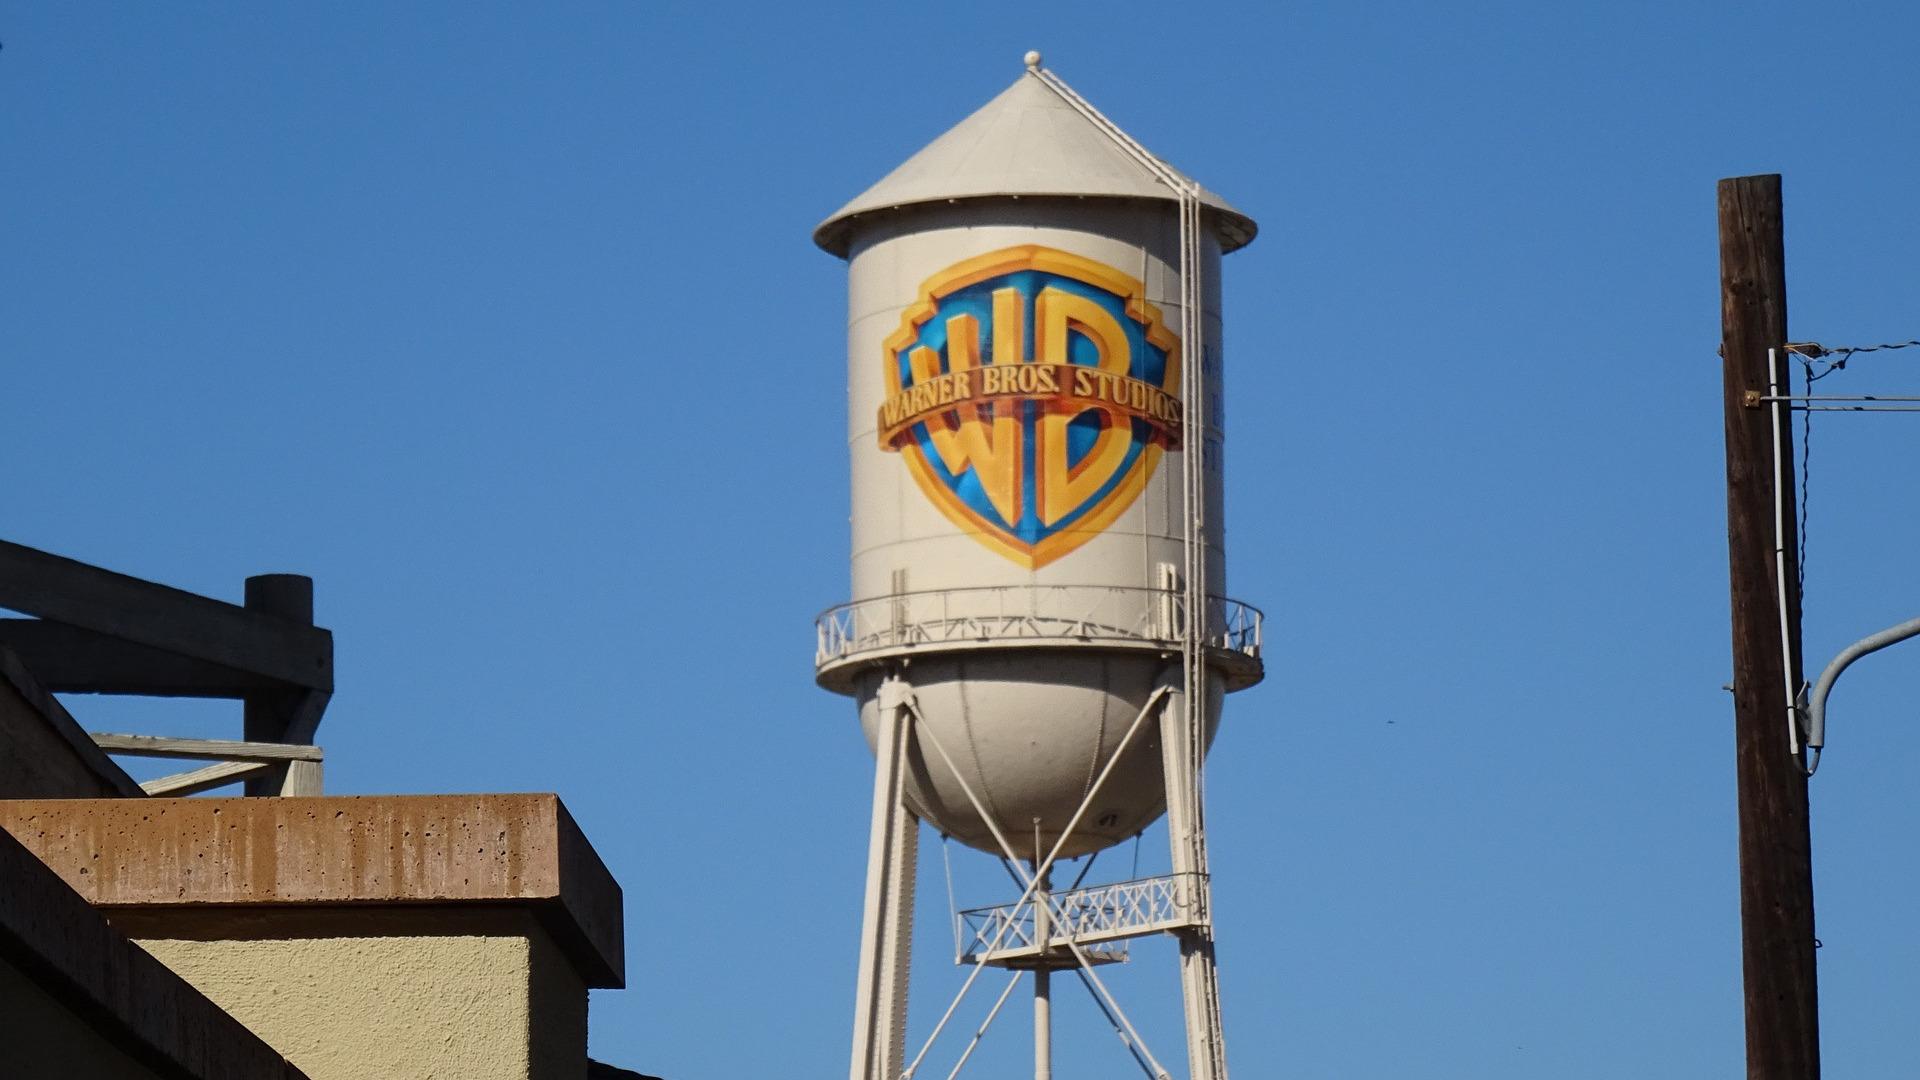 Warner Bros. Studio lot water tower